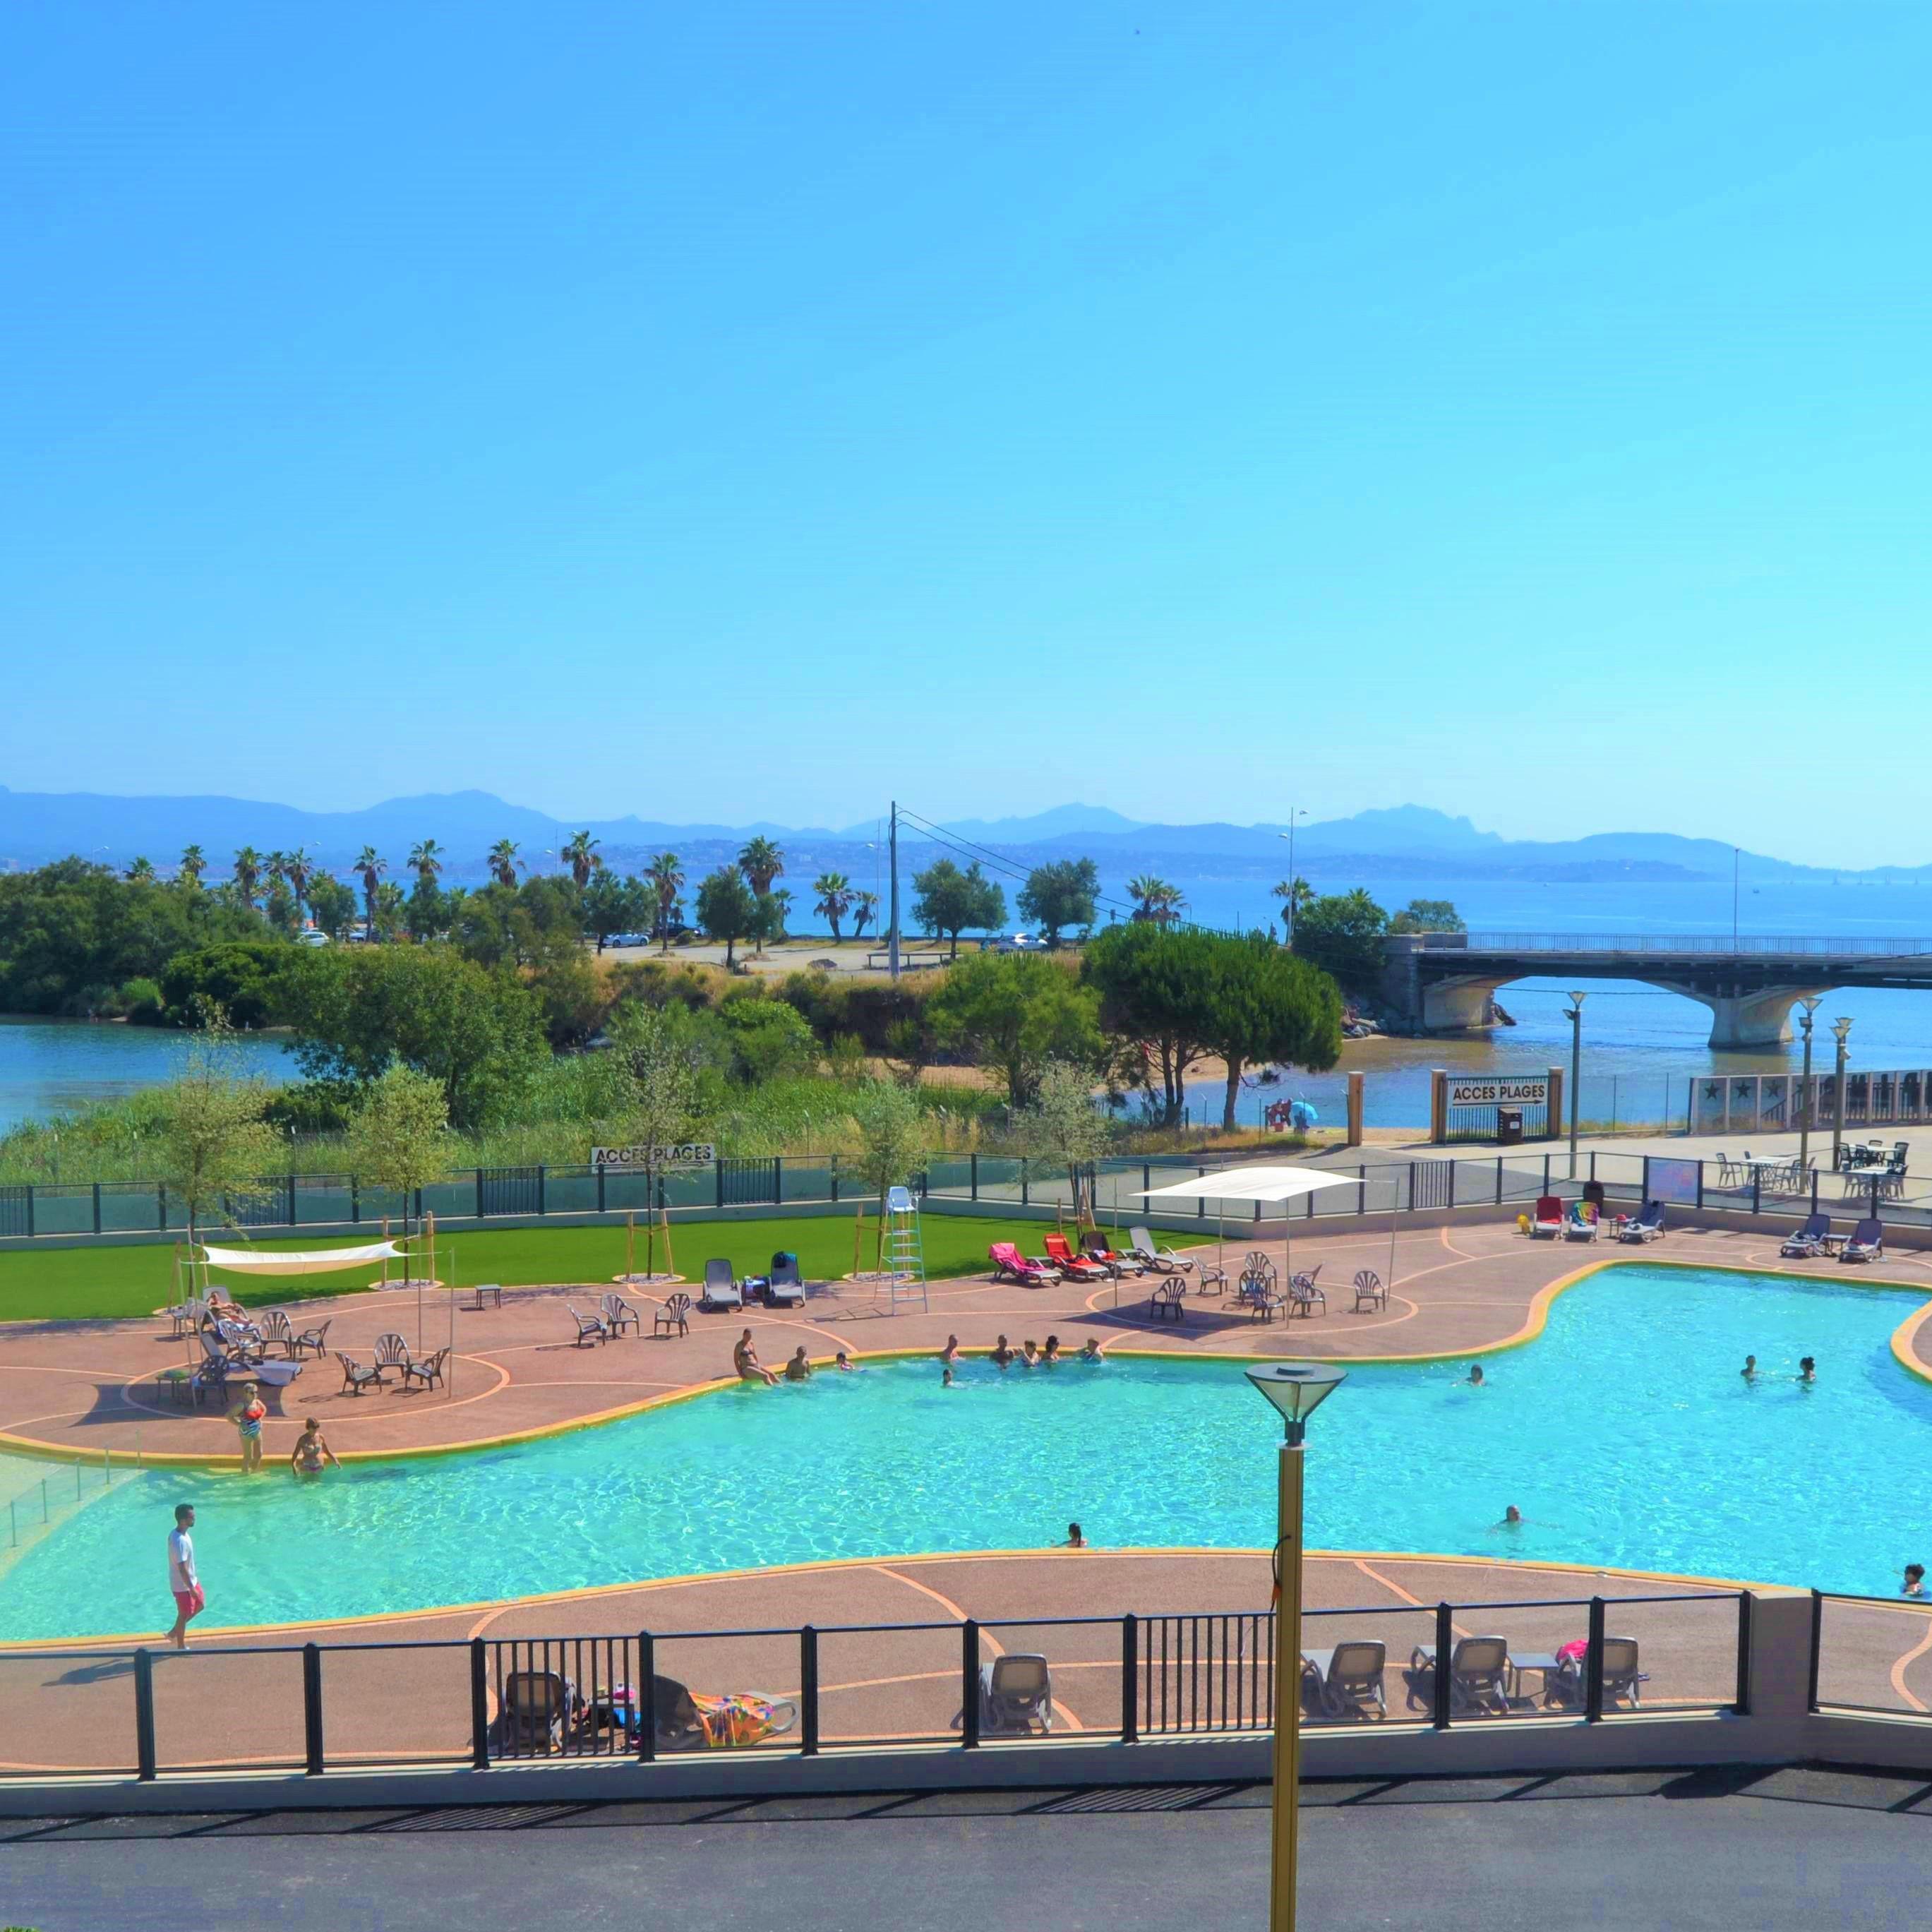 Campeggio Saint Aygulf plage Cote d'Azur | Greenchalets IT